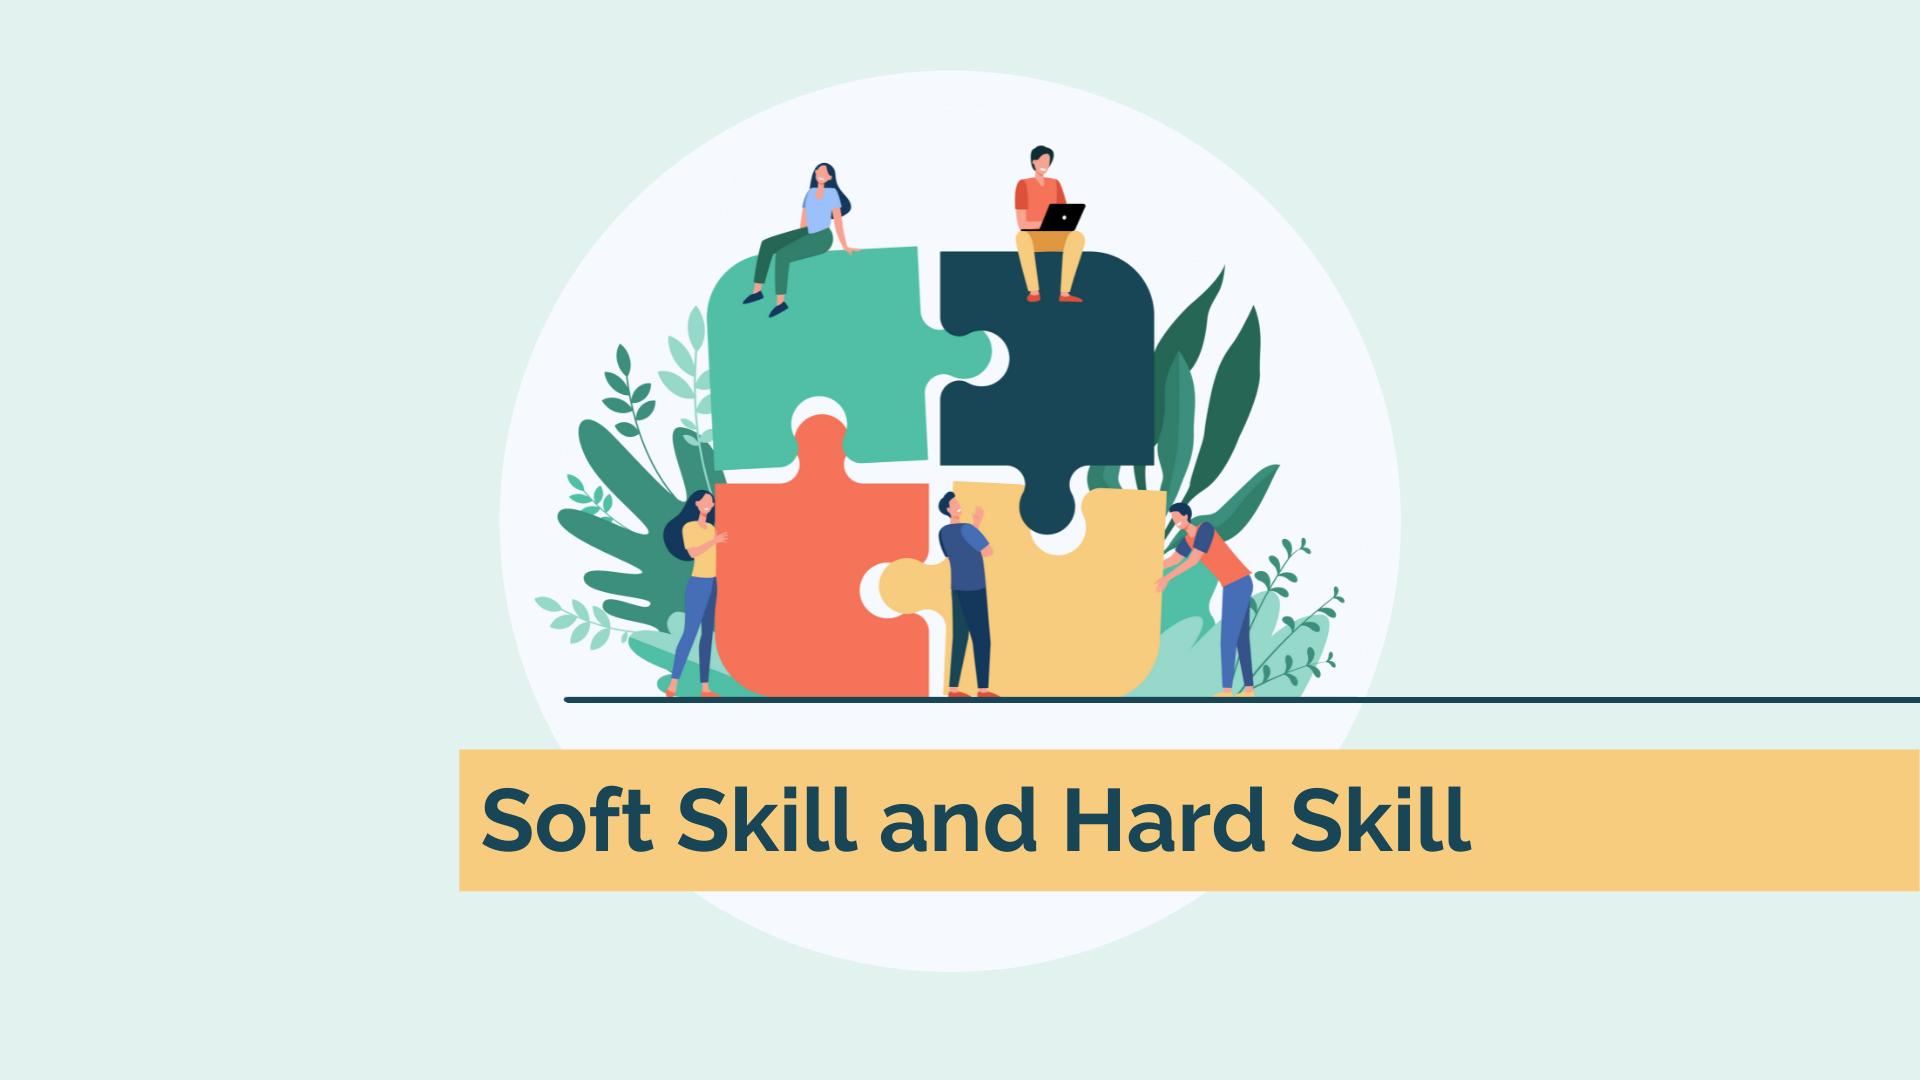 Soft Skill and Hard Skill course image